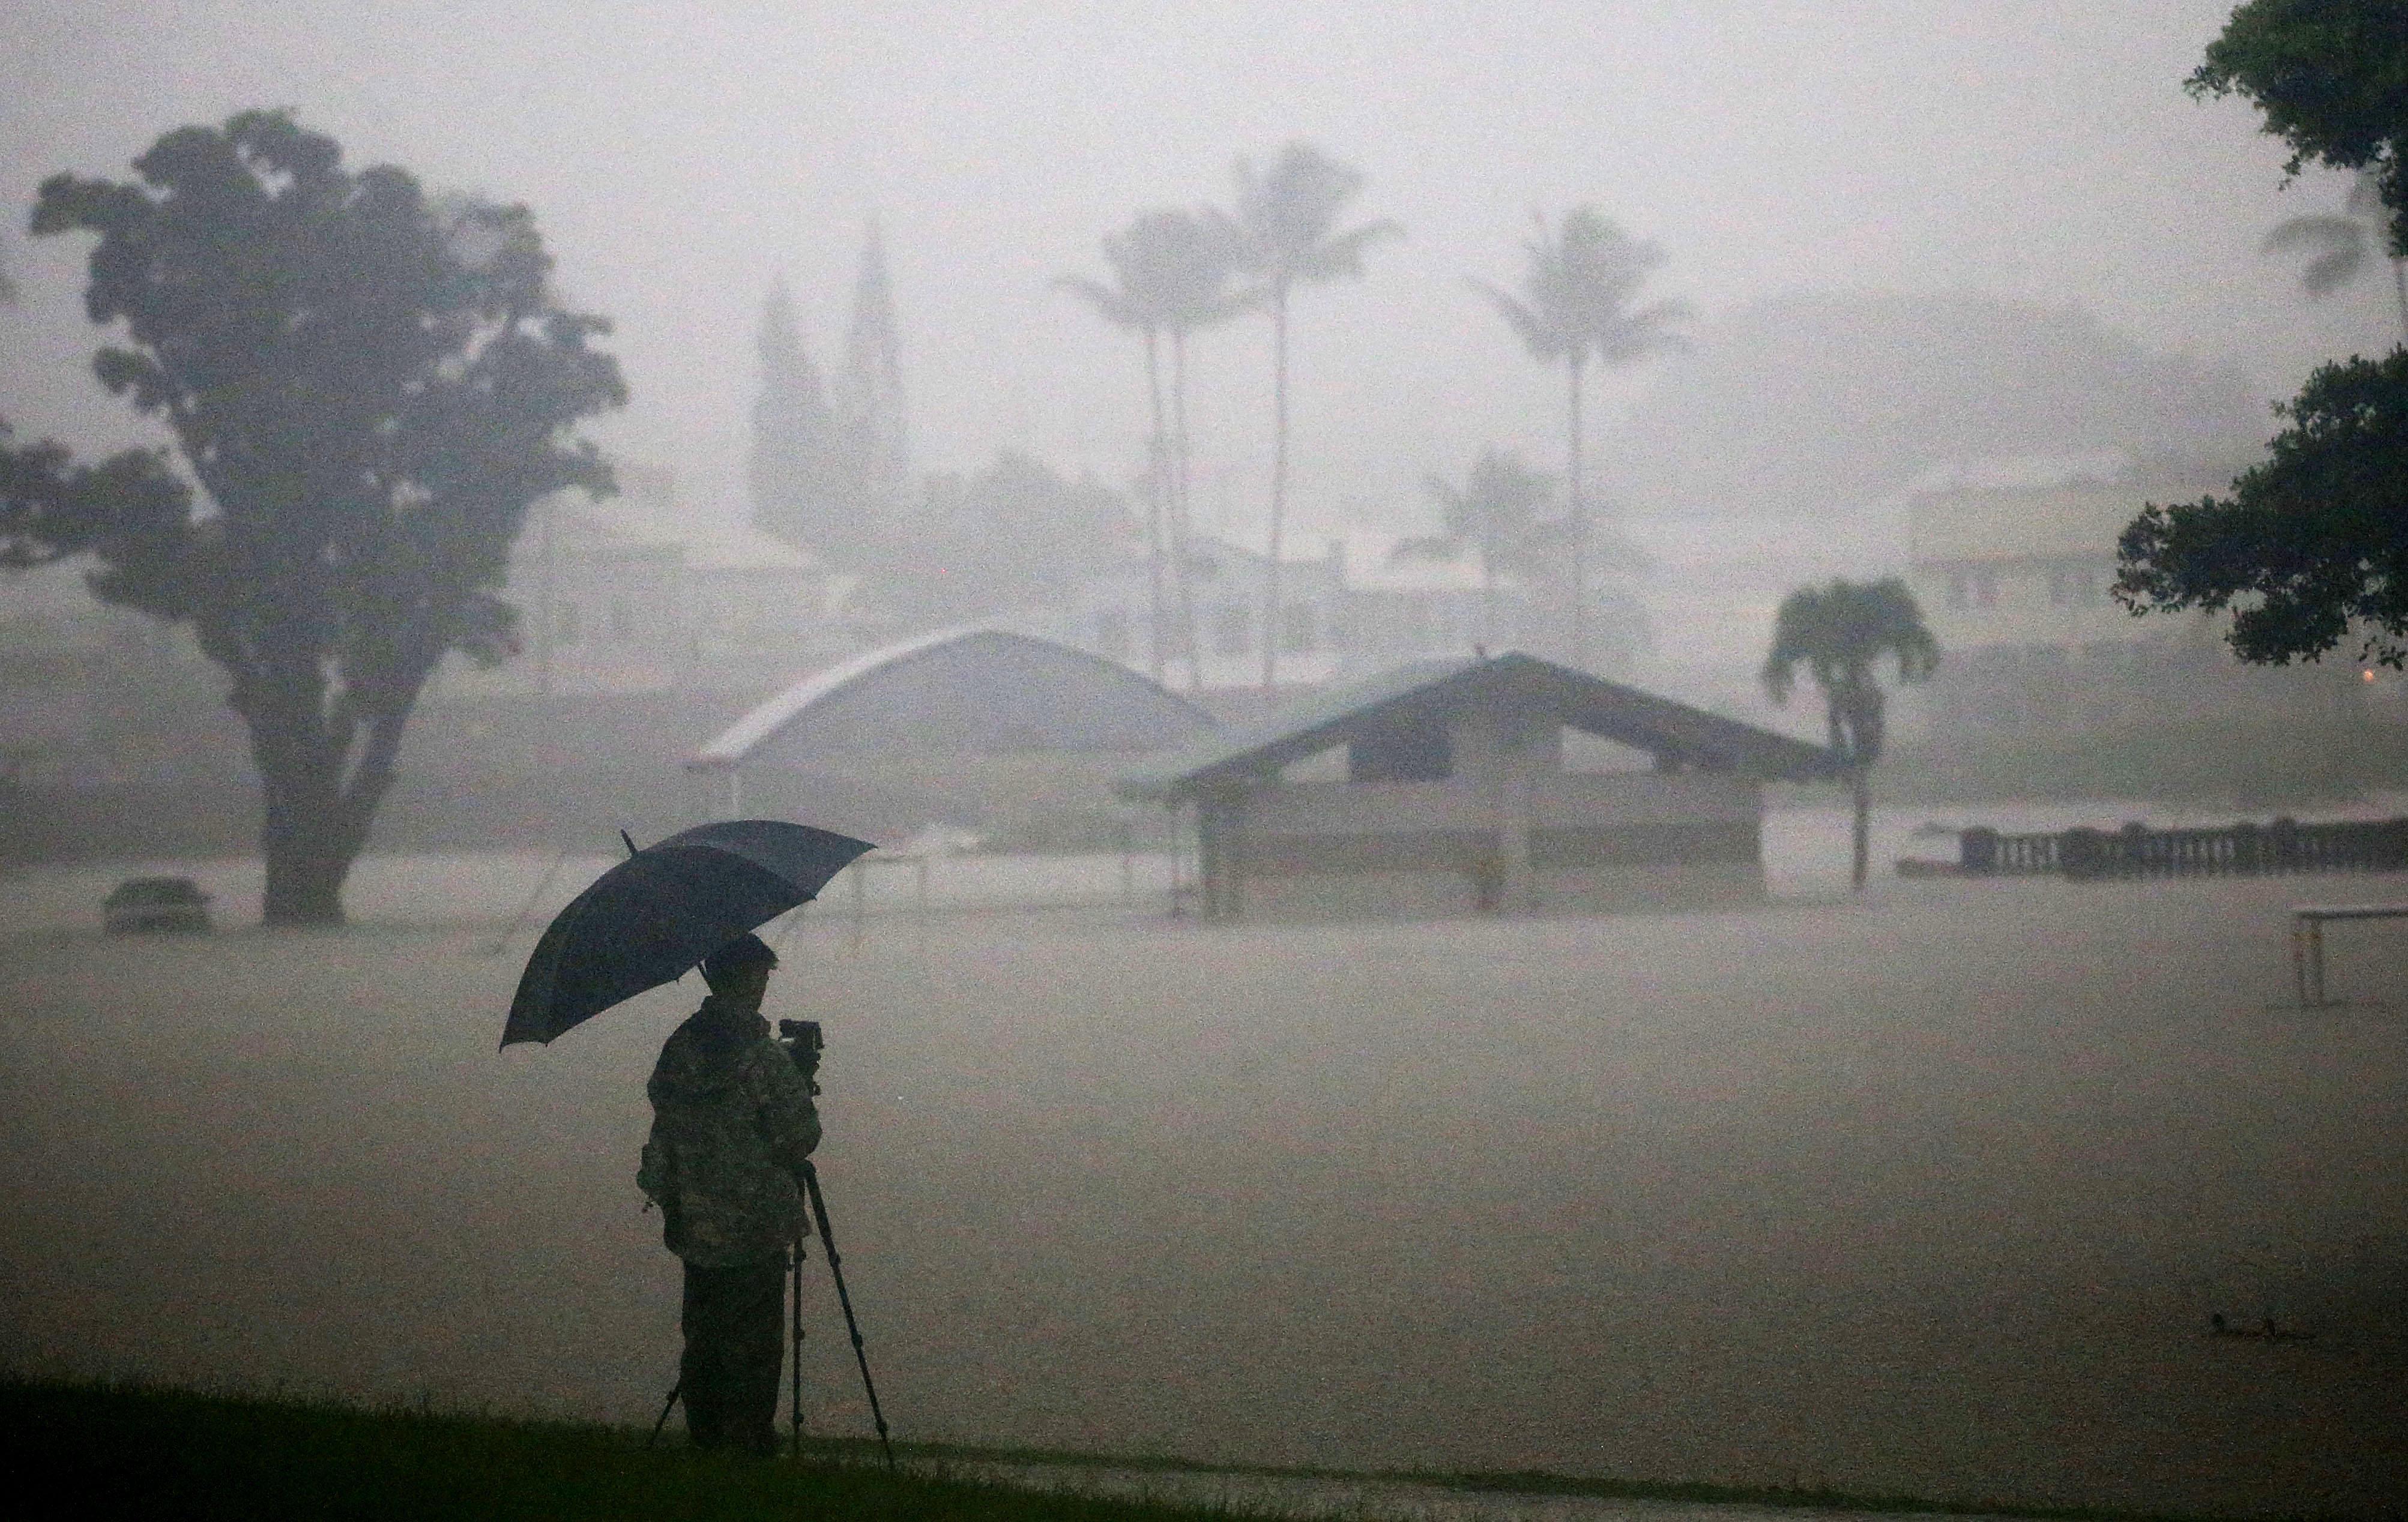 Slow-moving Hurricane Lane threatens prolonged heavy rainfall on Hawaii